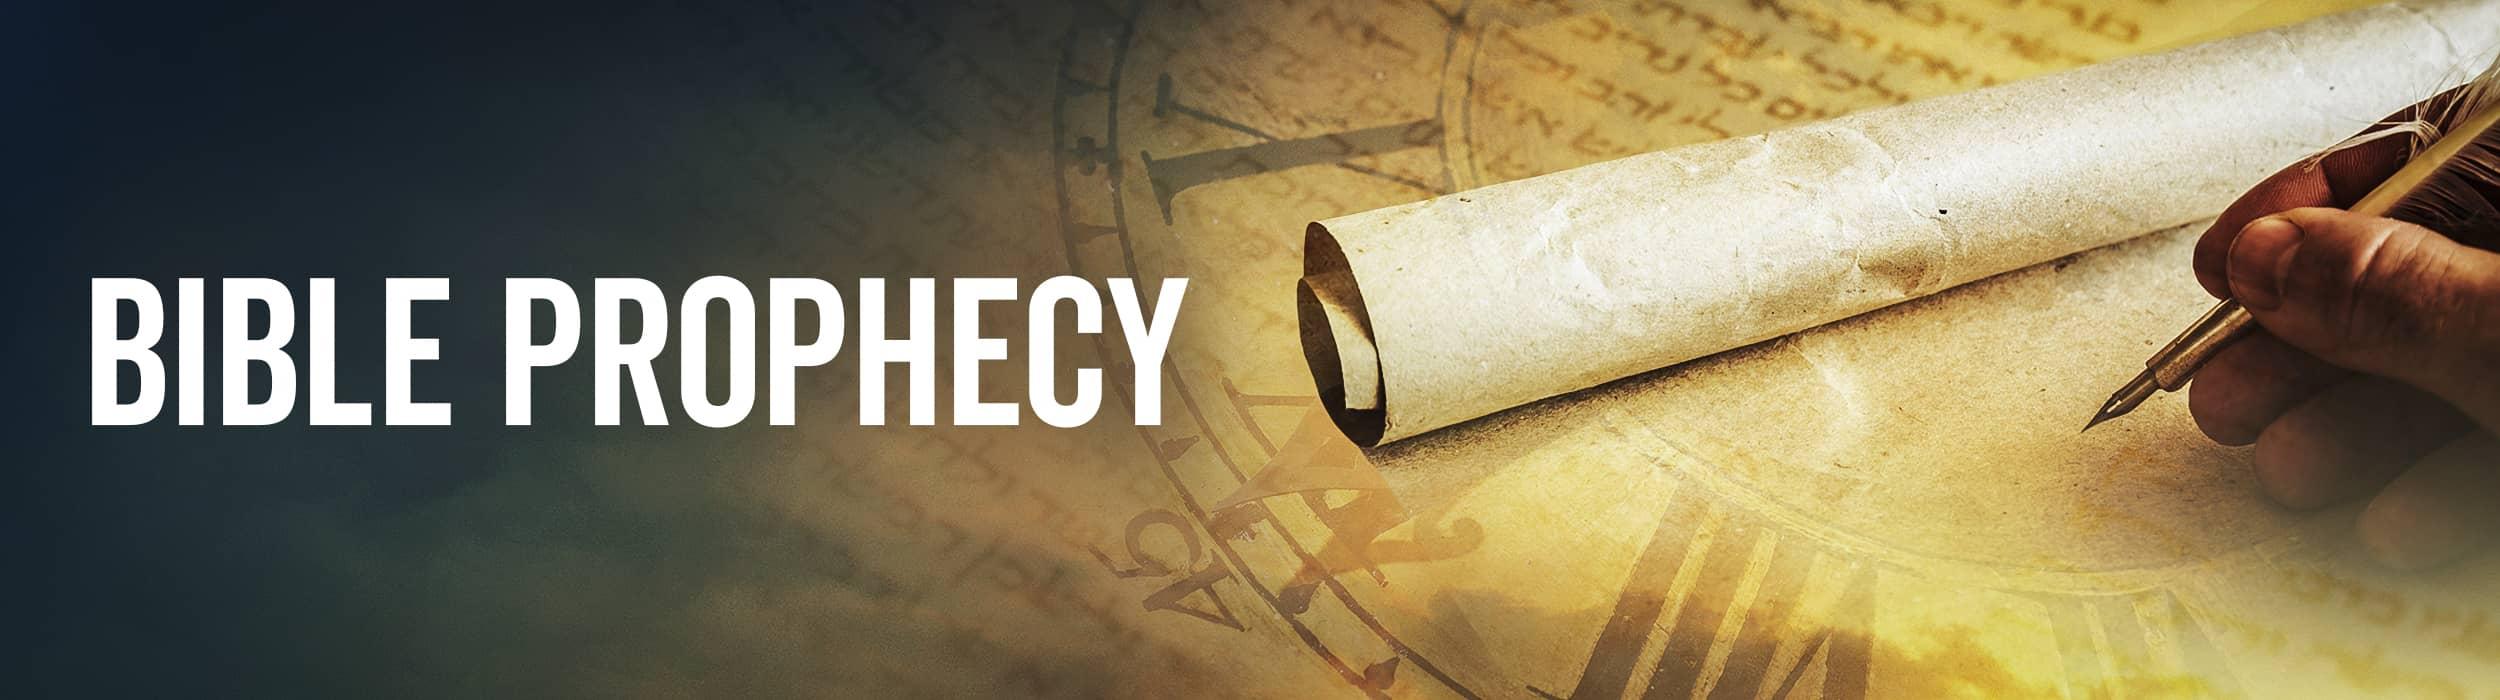 Bible prophecy online courses, prophecy online courses